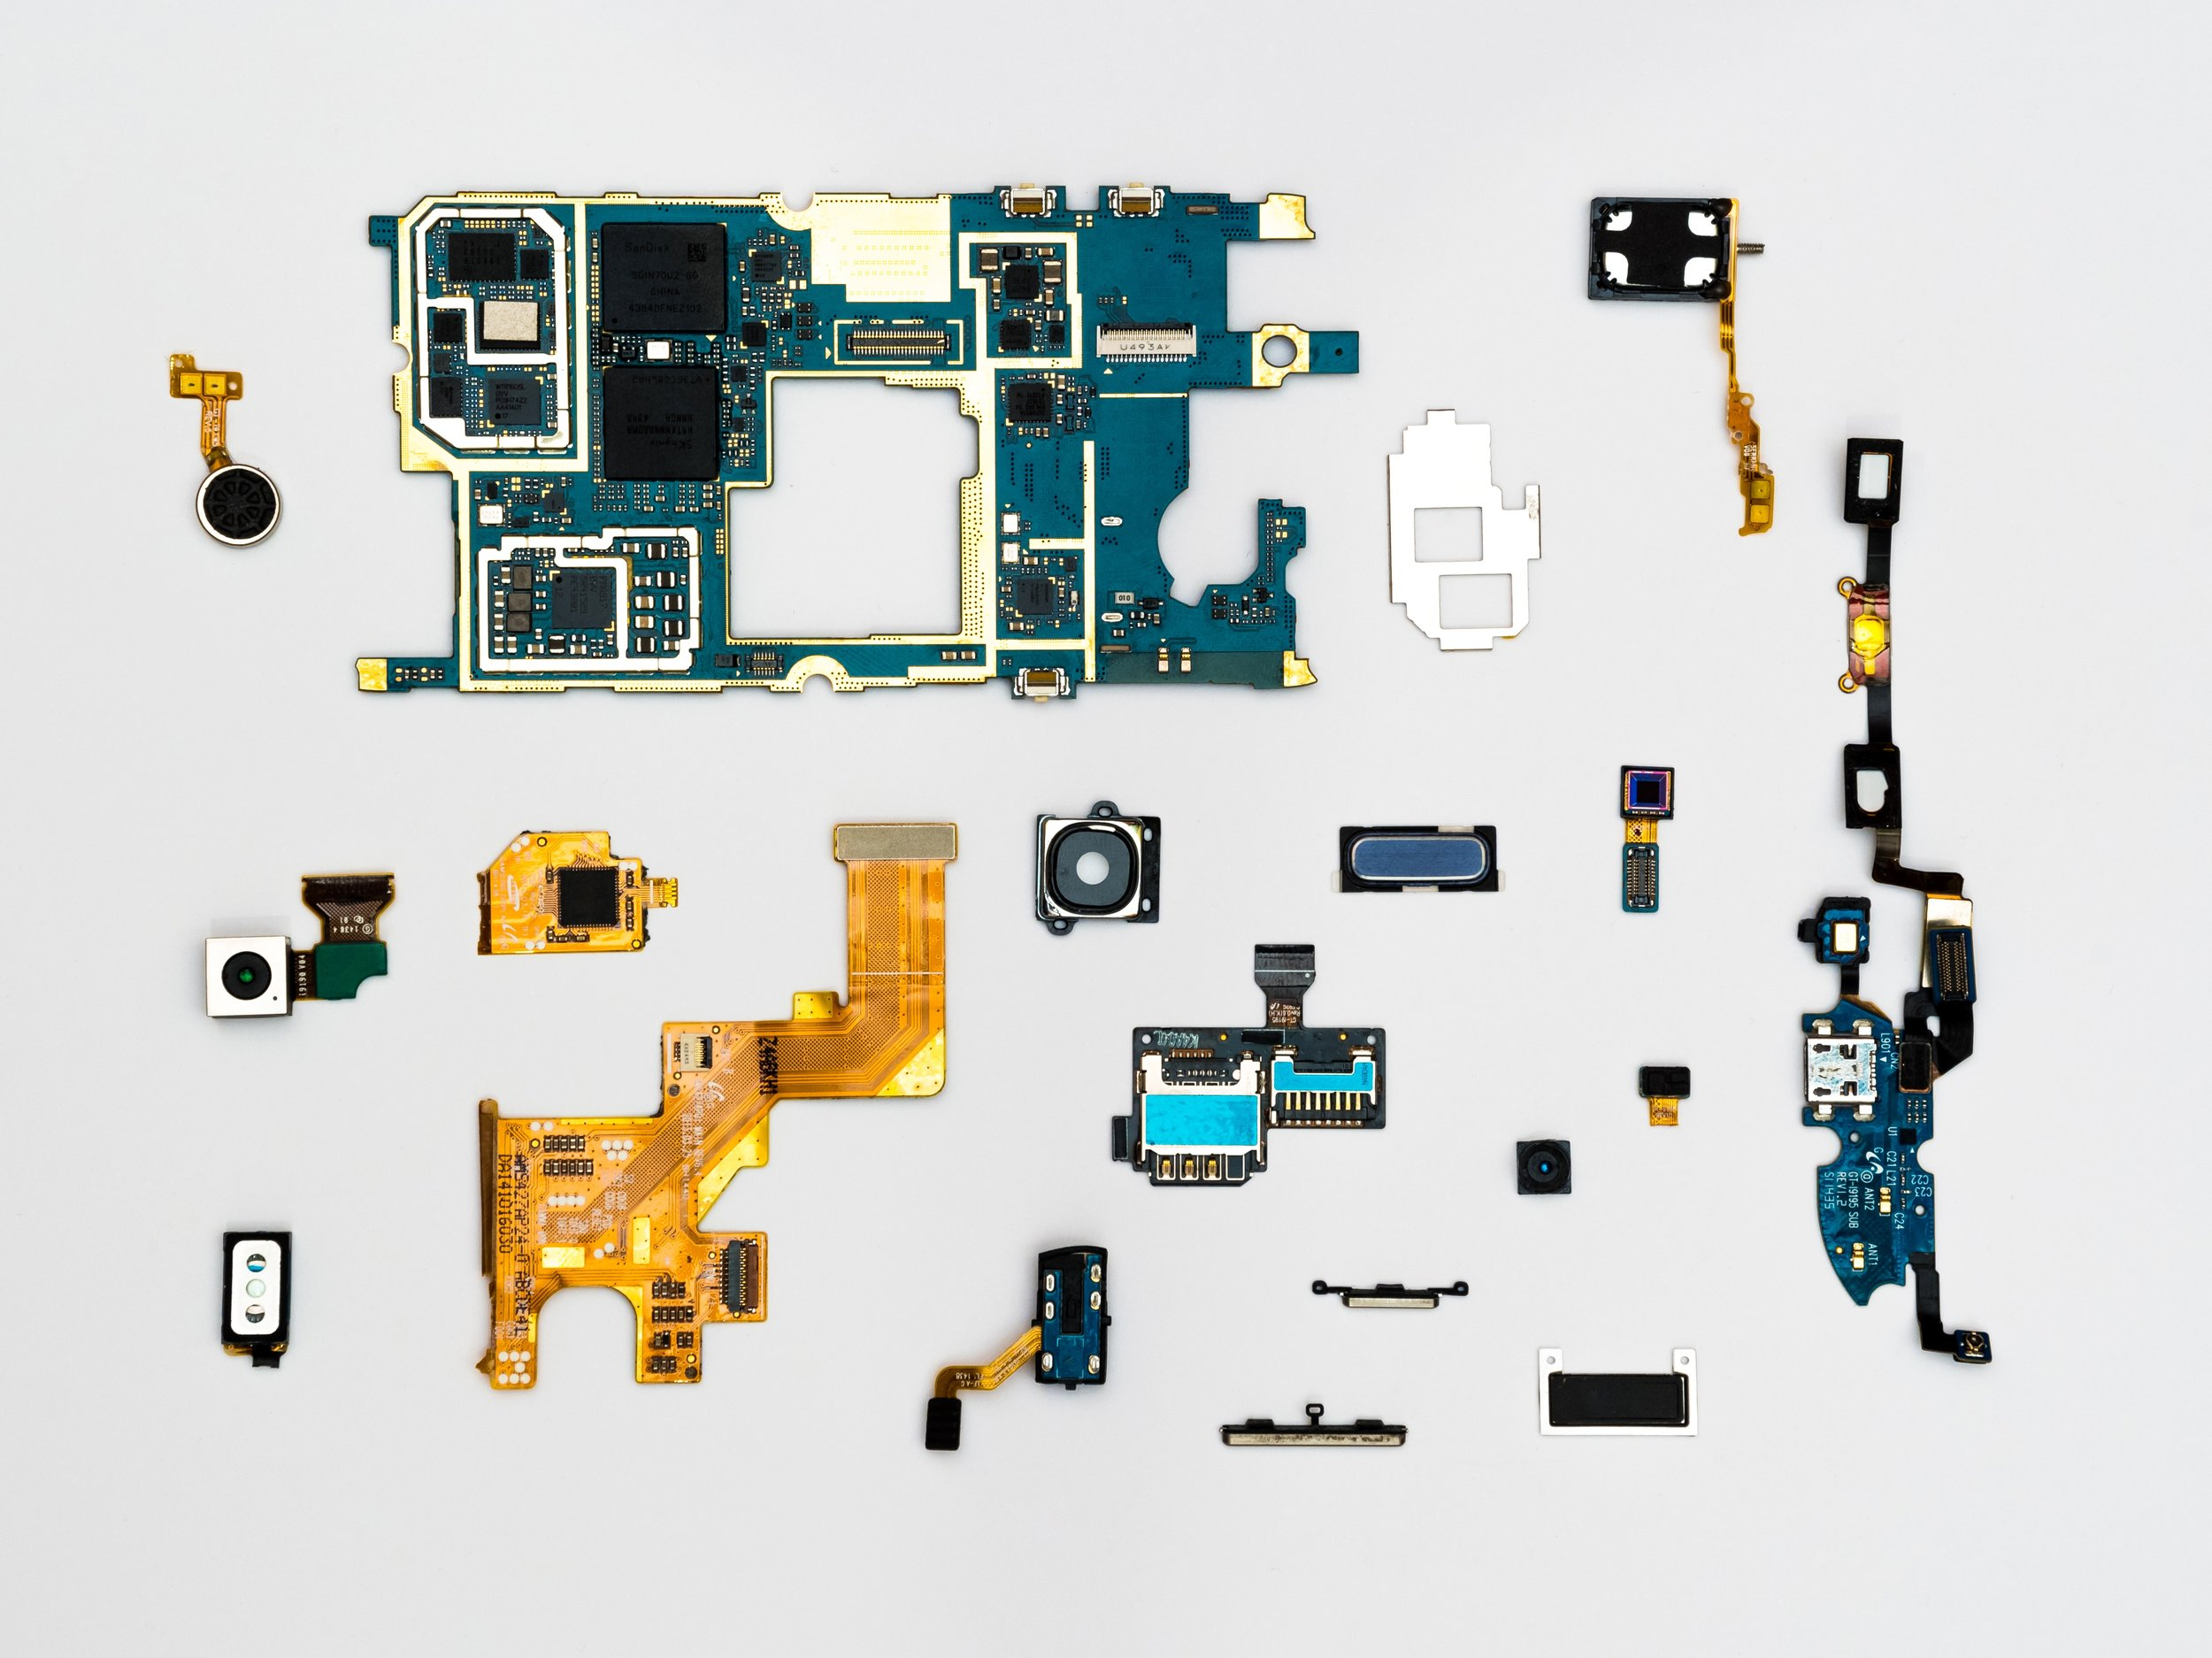 business-circuits-computer-1476321.jpg